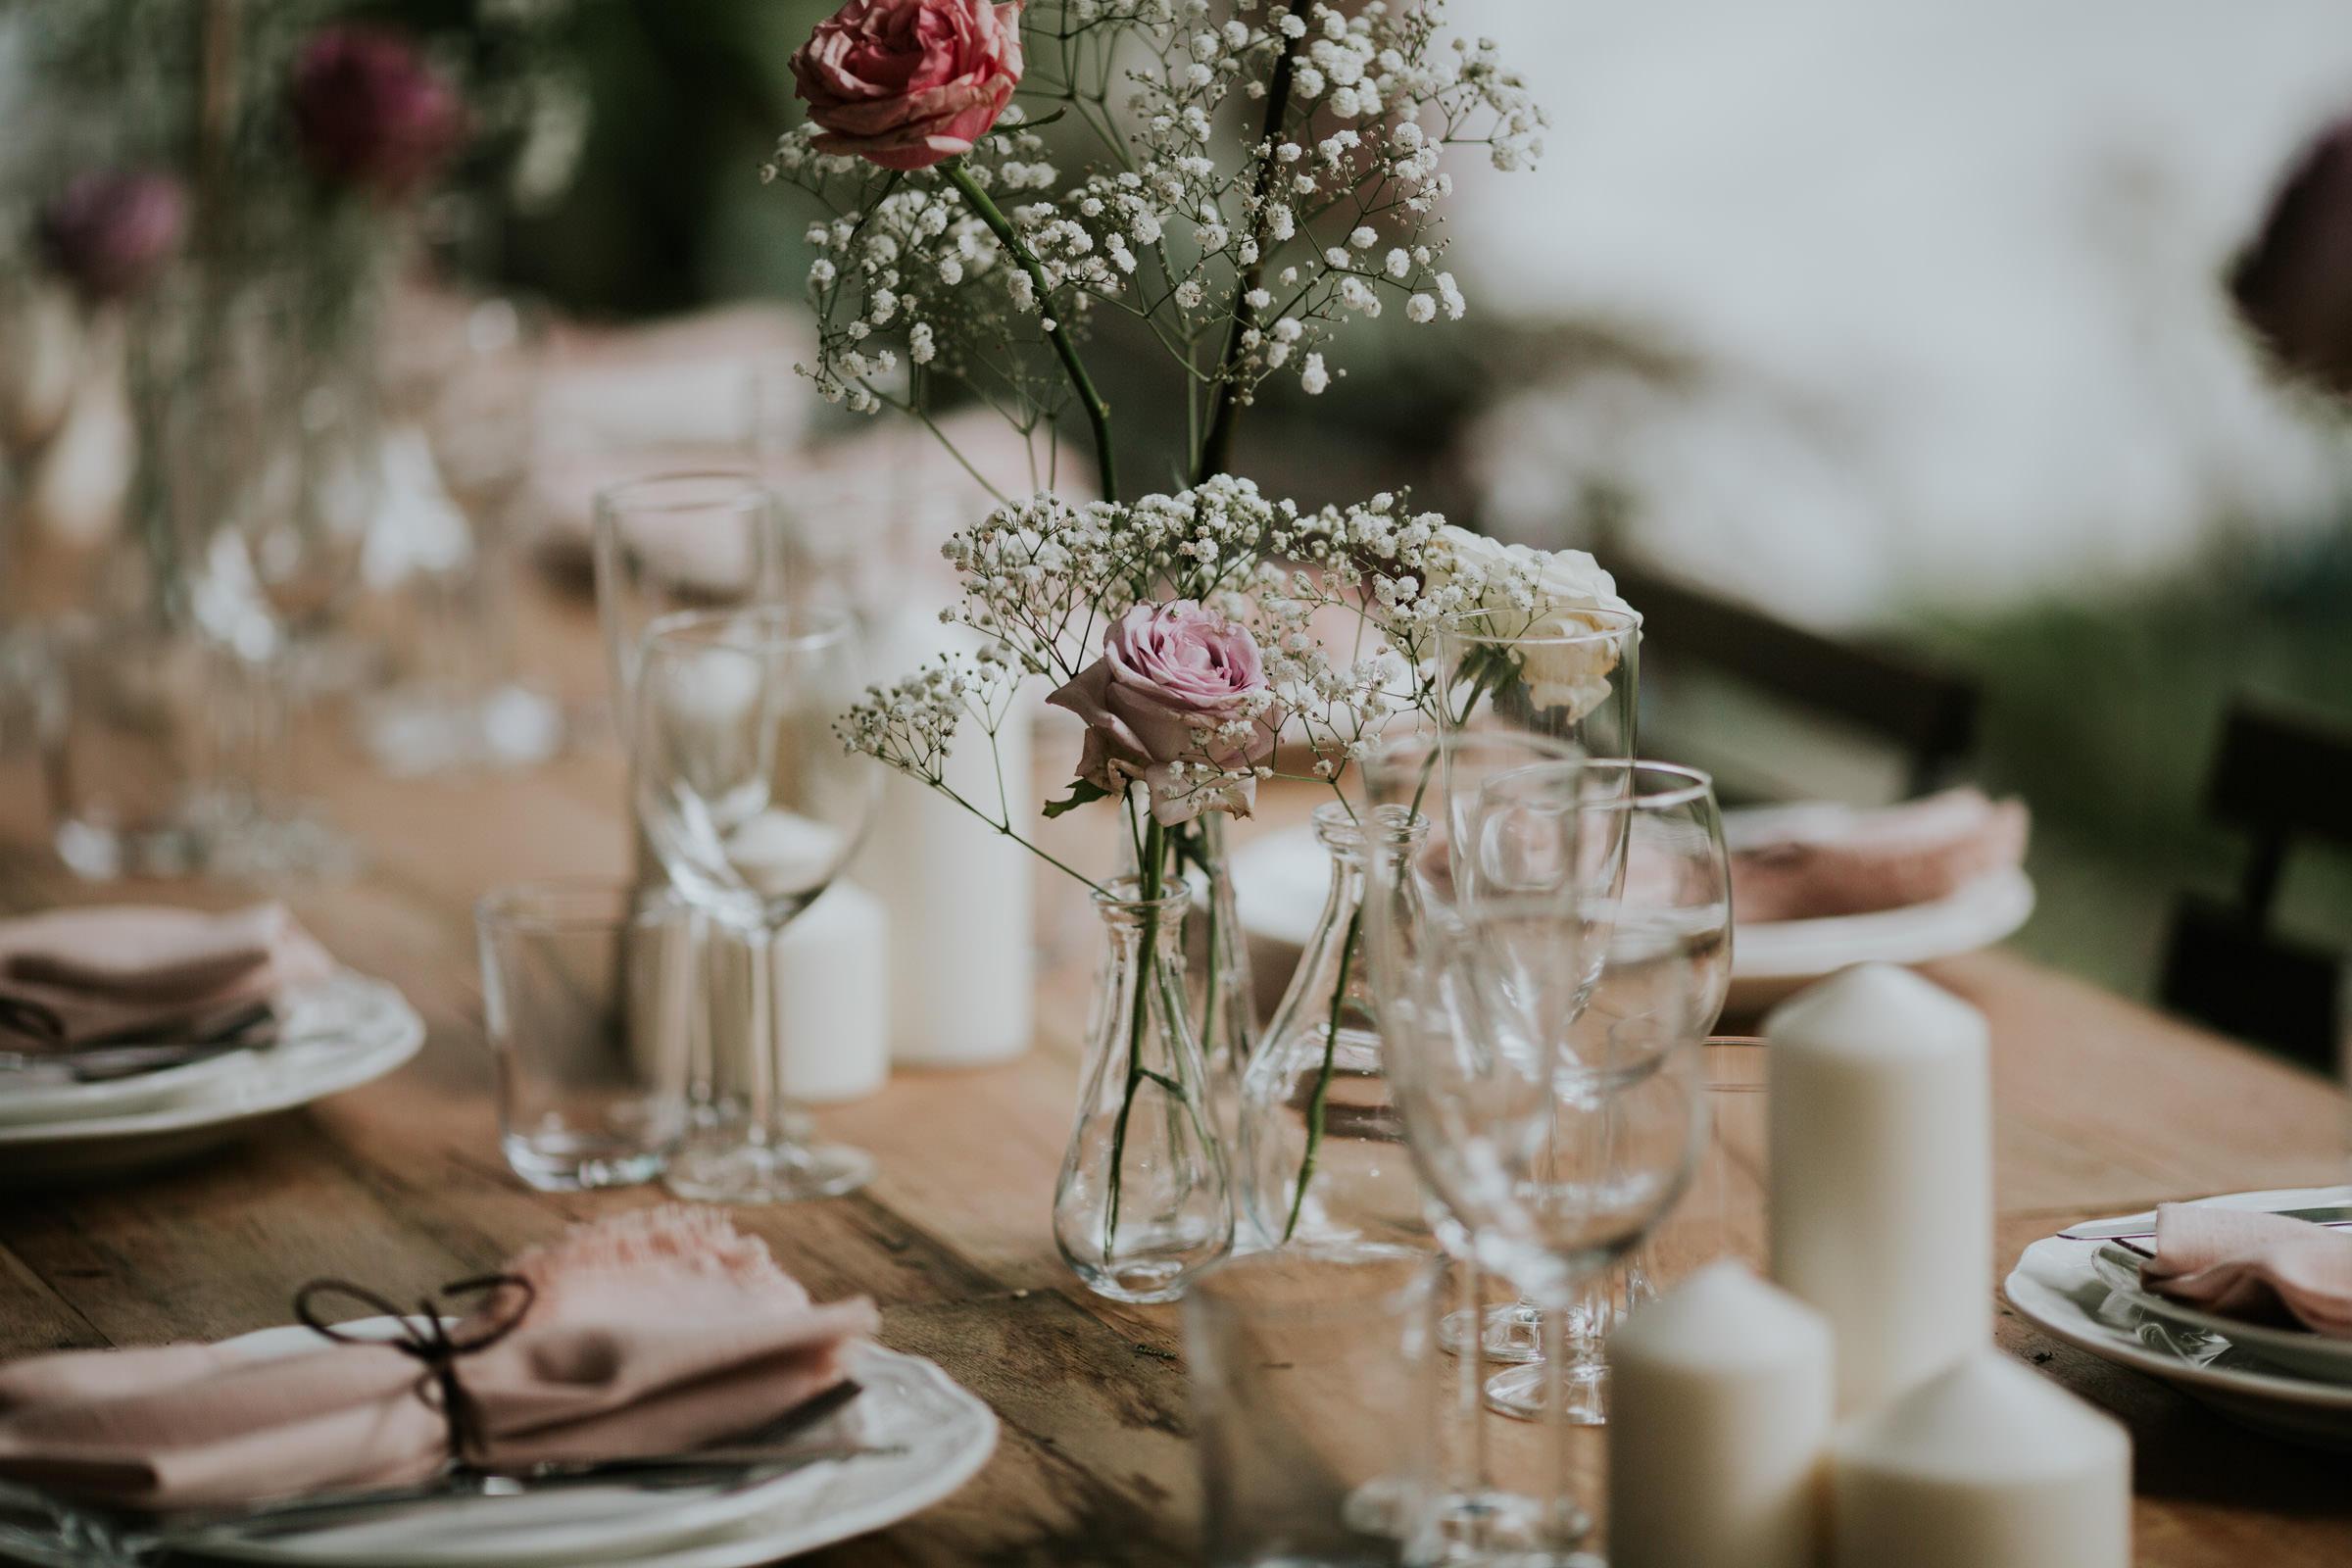 Emma+John+Far+South+Coast+Wedding+Festivl+Glamping+Bush+STYLING-2.jpg